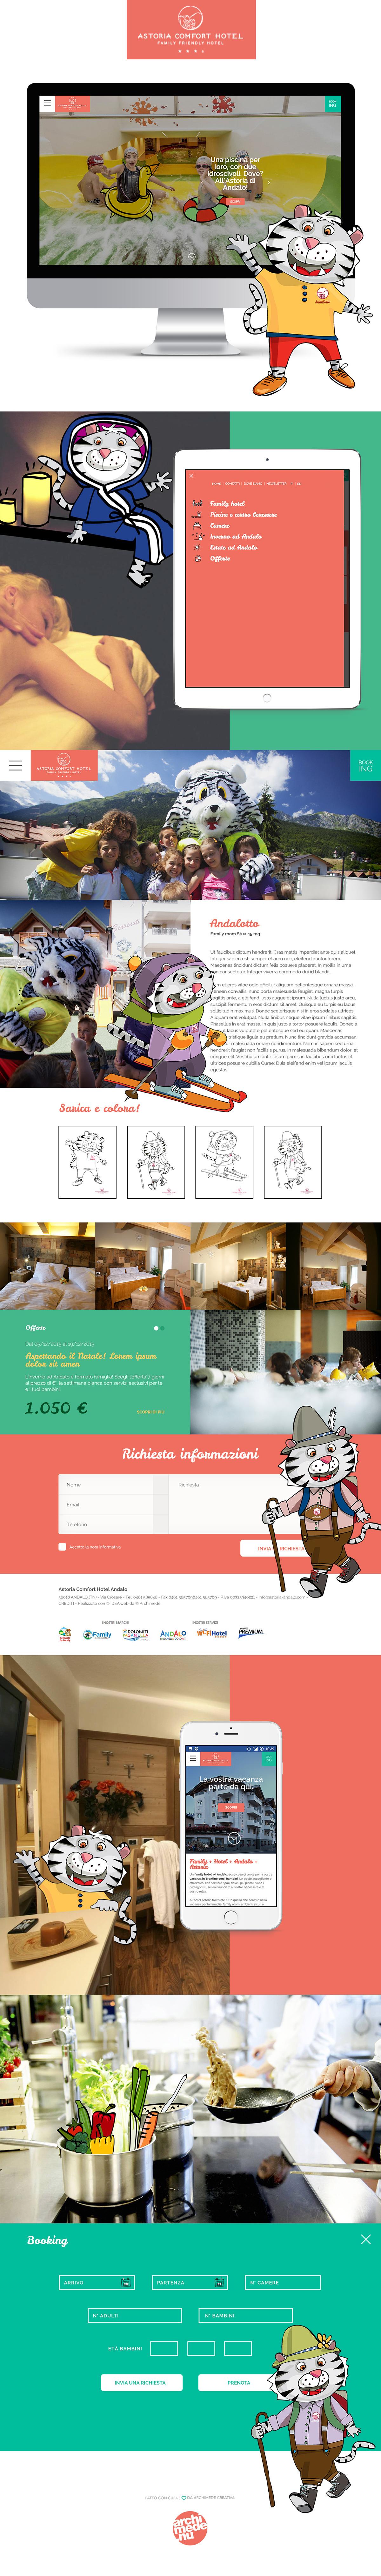 Hotel Astoria andalo archimede Archimde web agency Archimede Trento